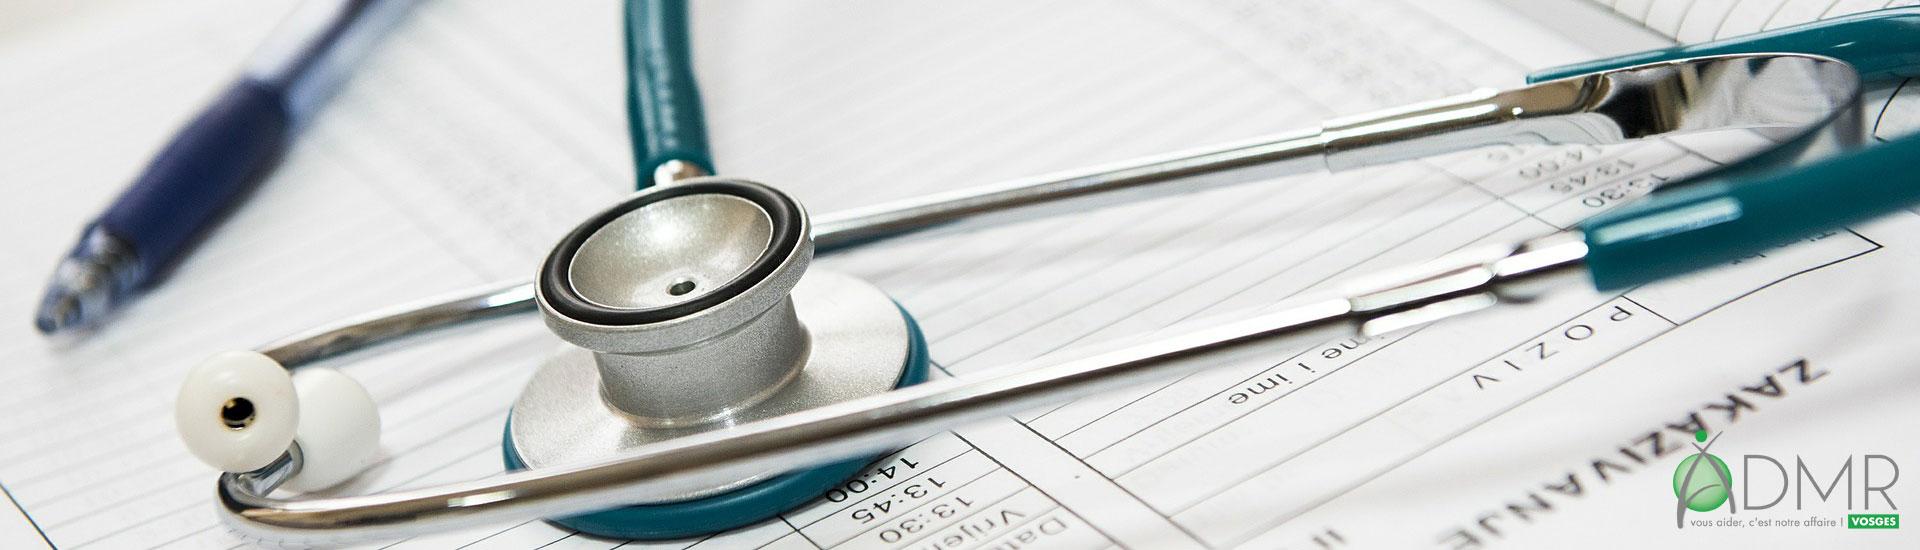 Hospitalisation à domicile (Copyright: Pixabay)